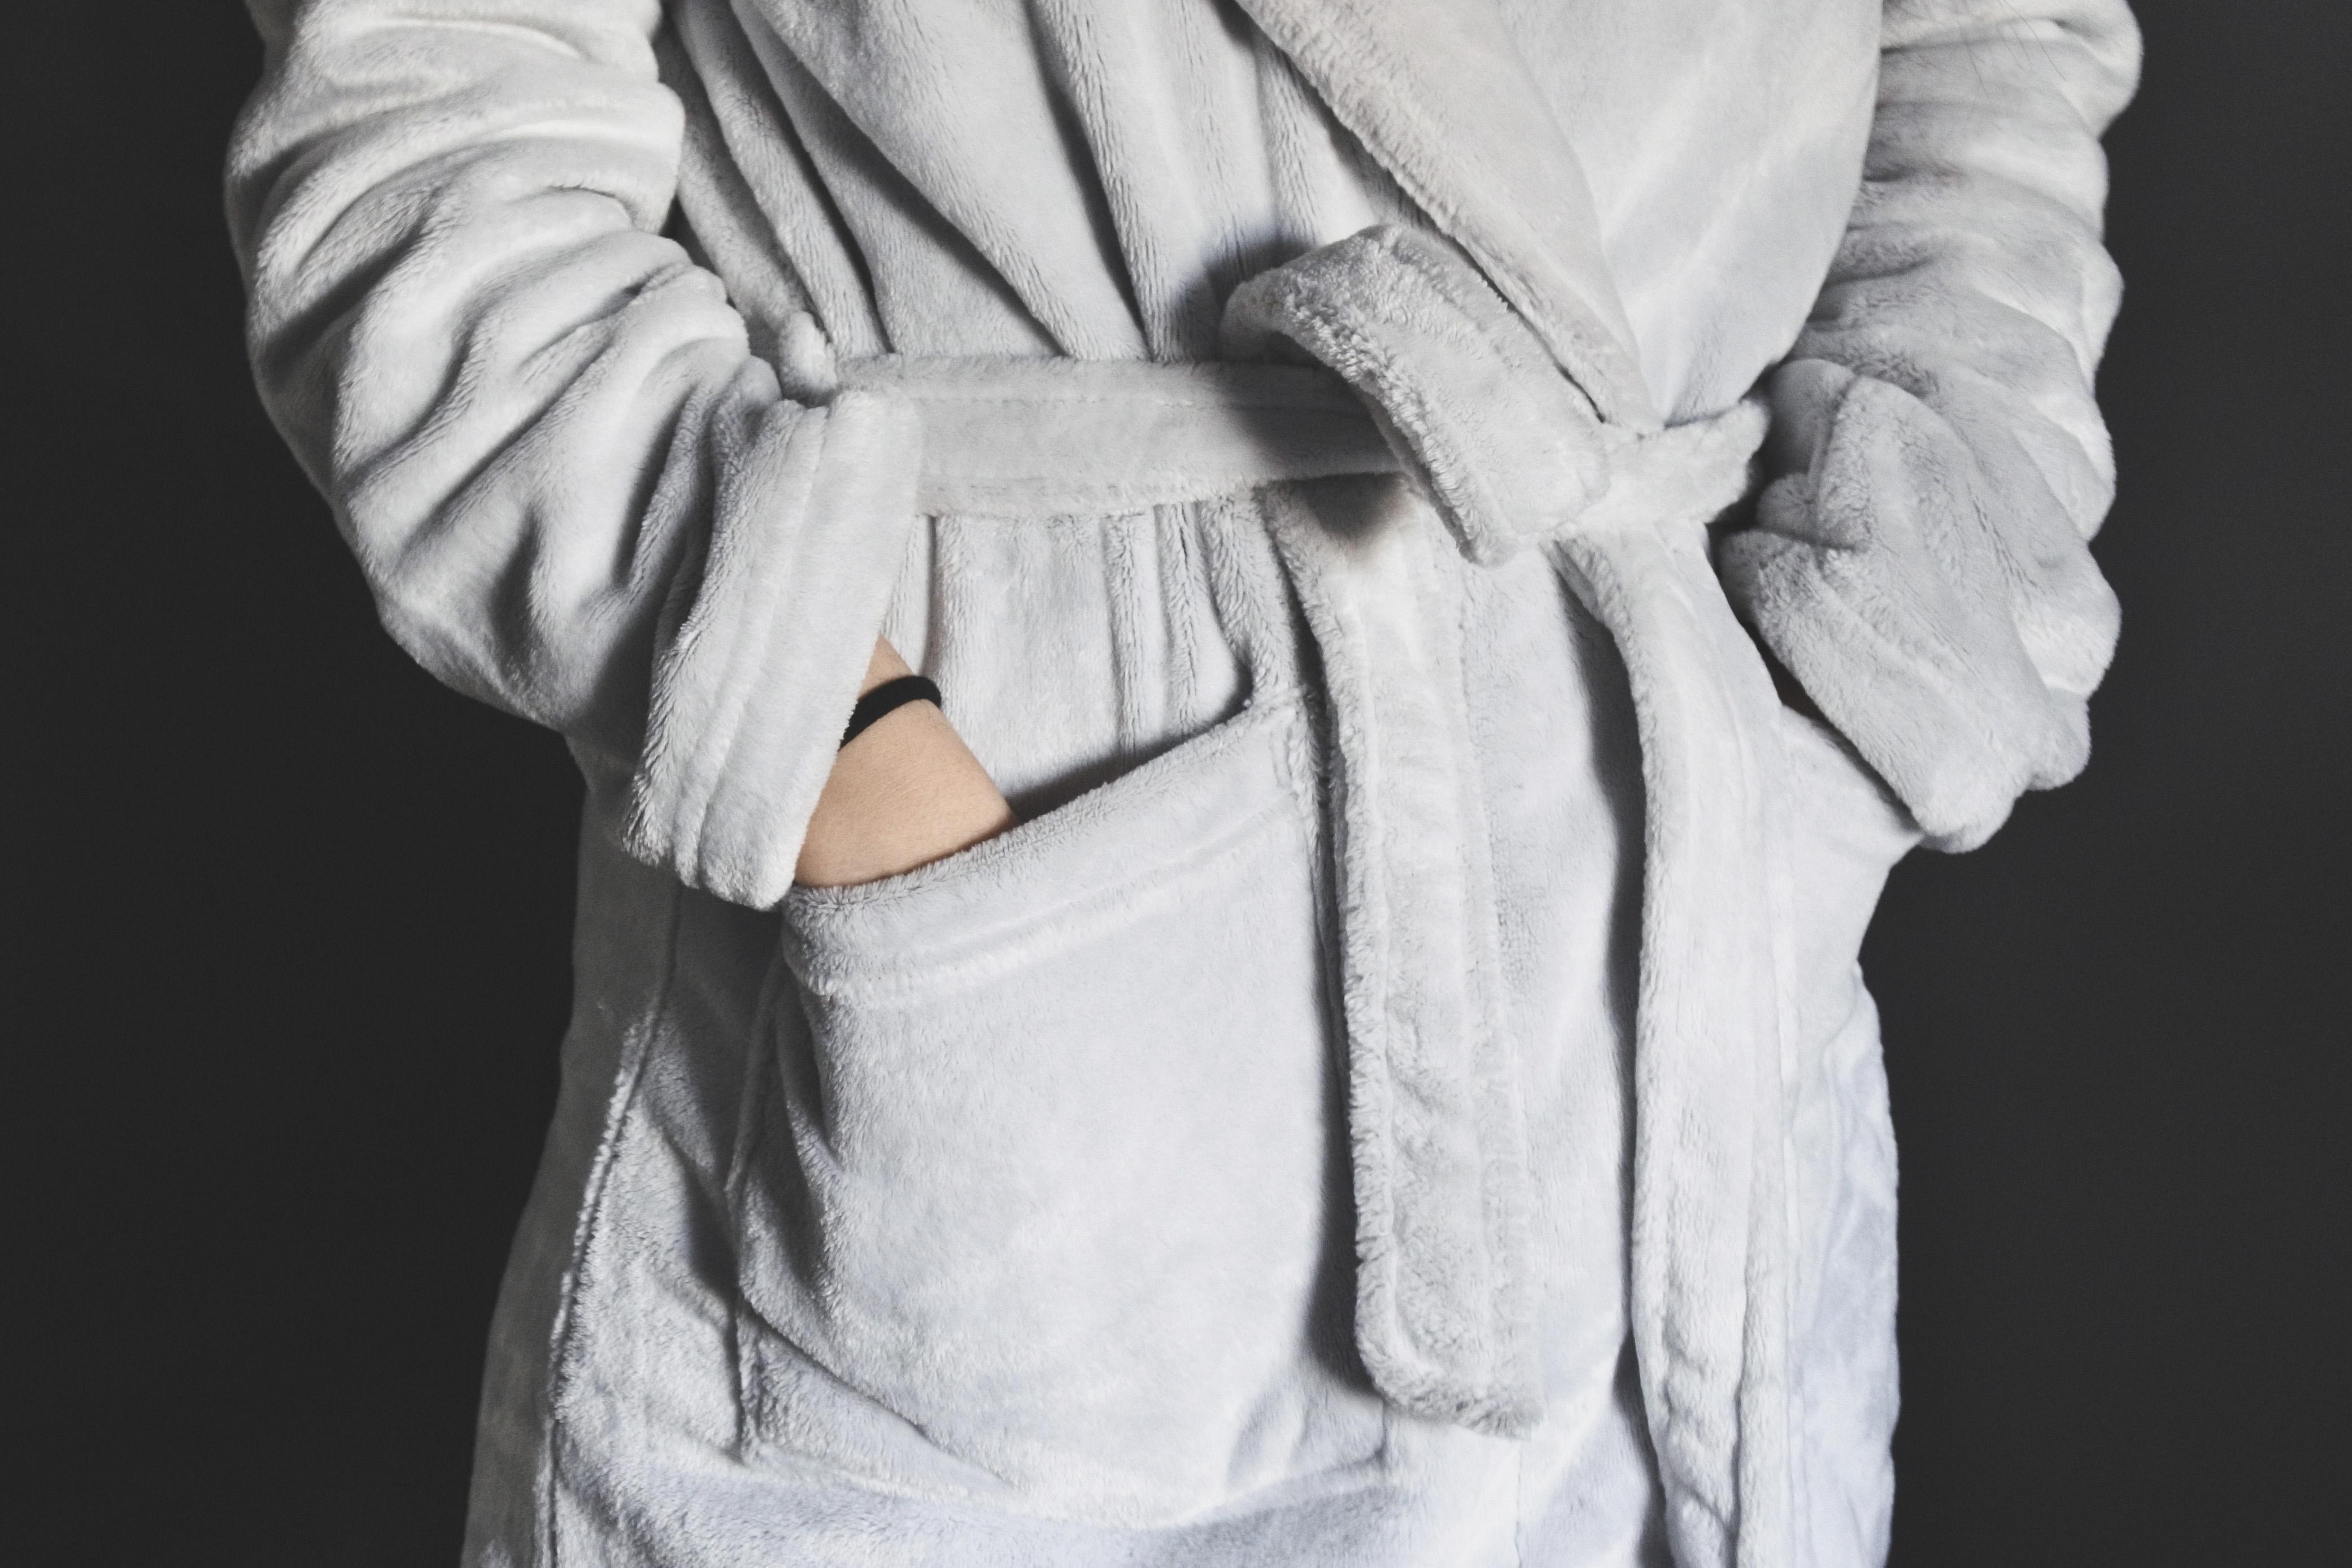 Wear a fuzzy robe after a bath